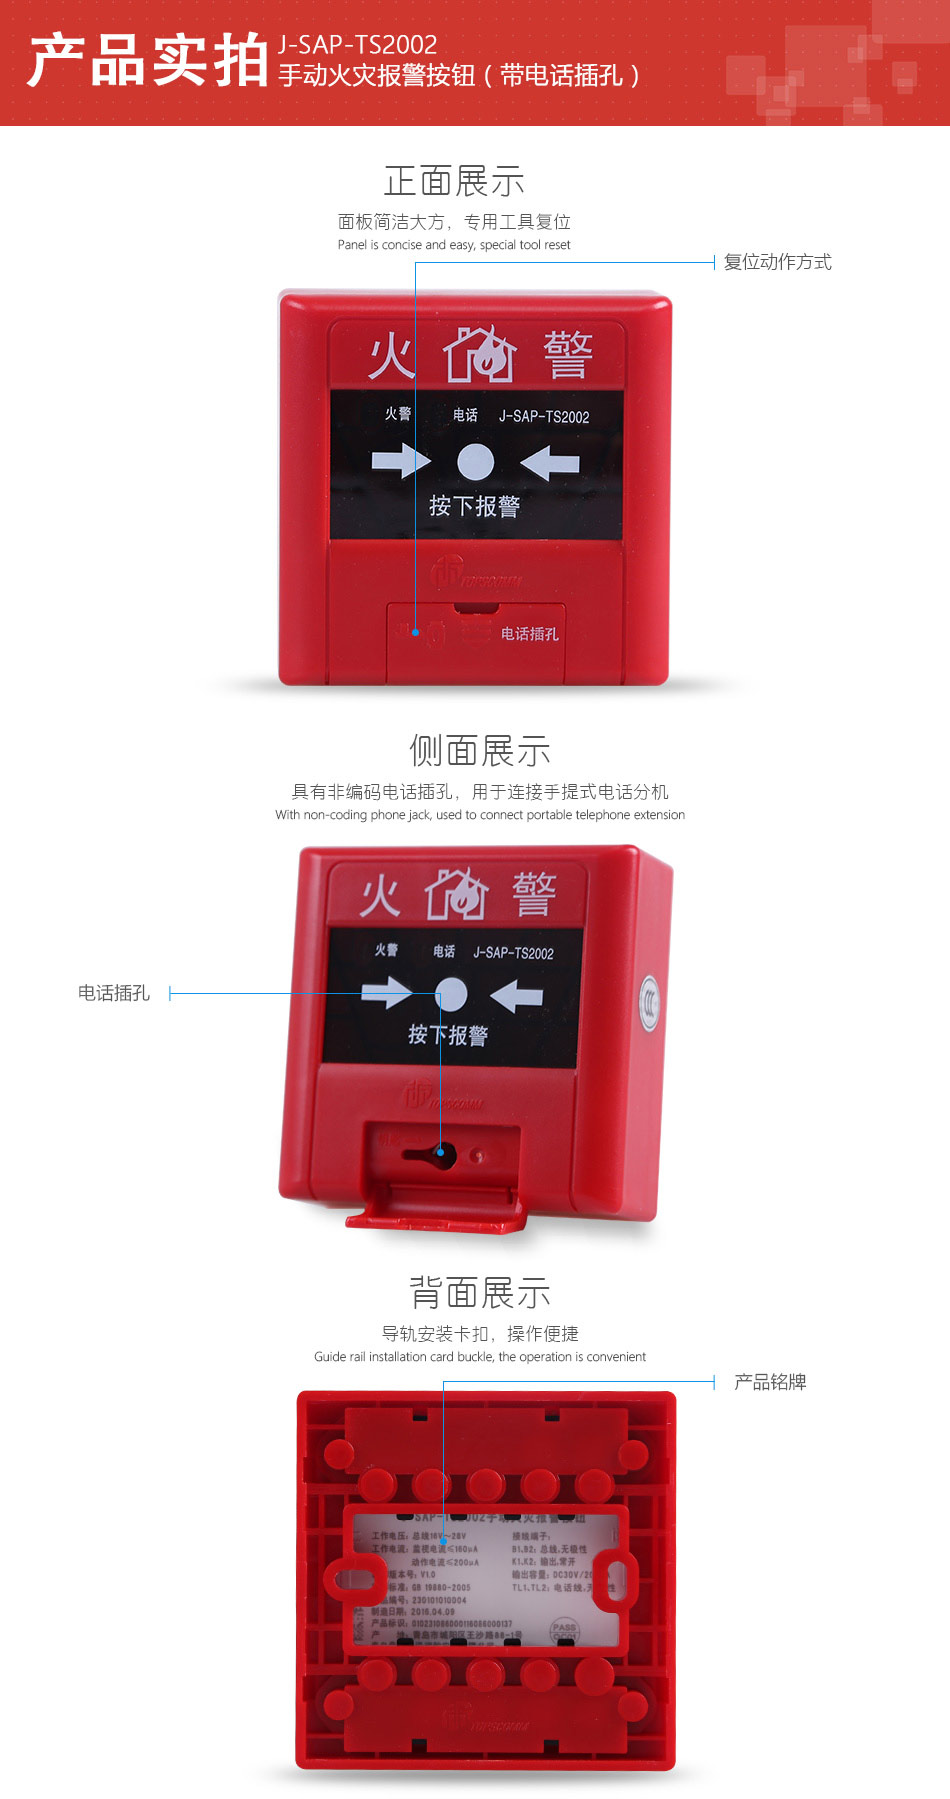 J-SAP-TS2002产品实拍